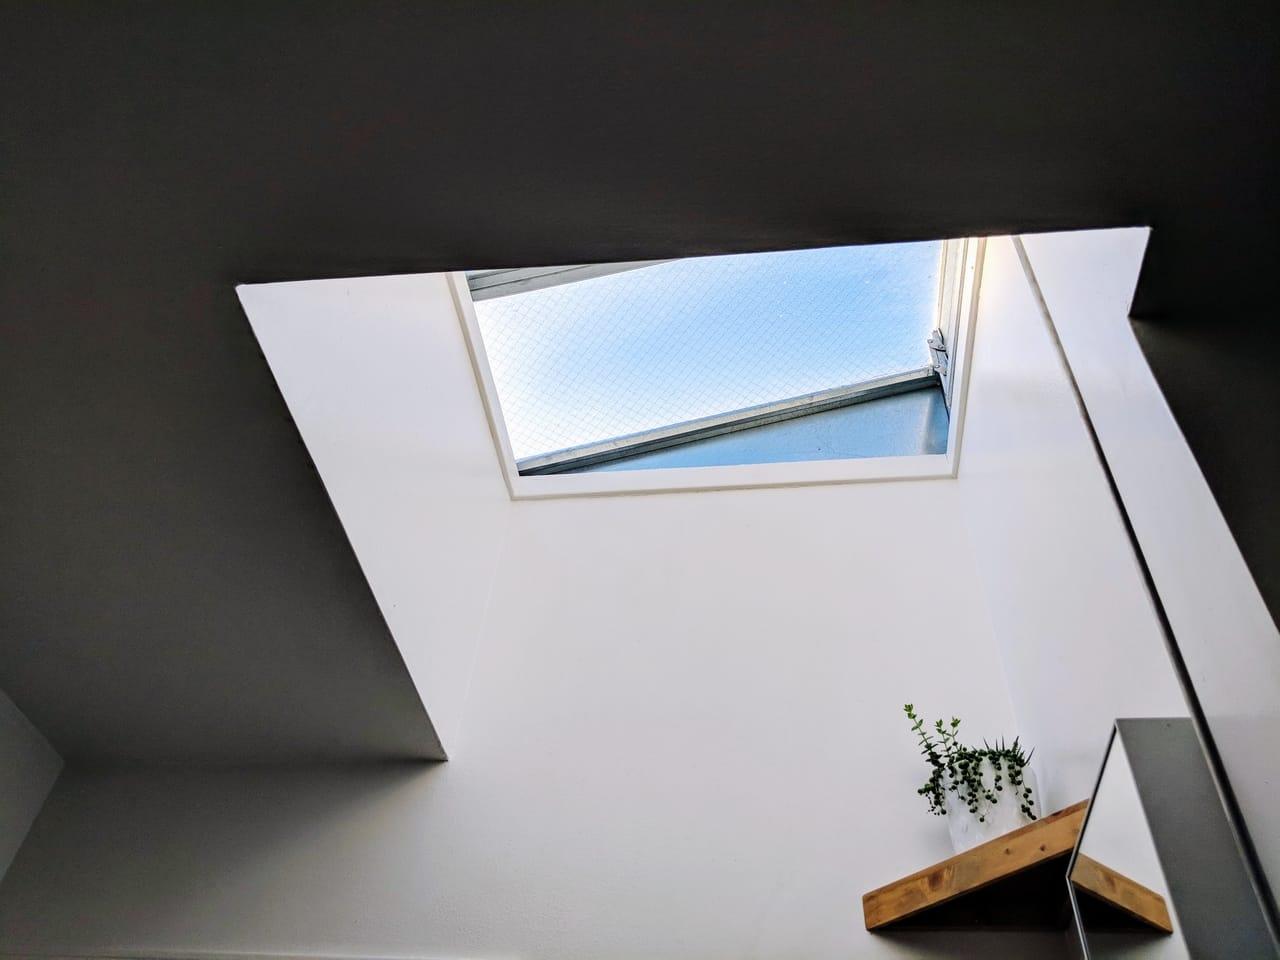 skylight-in-house